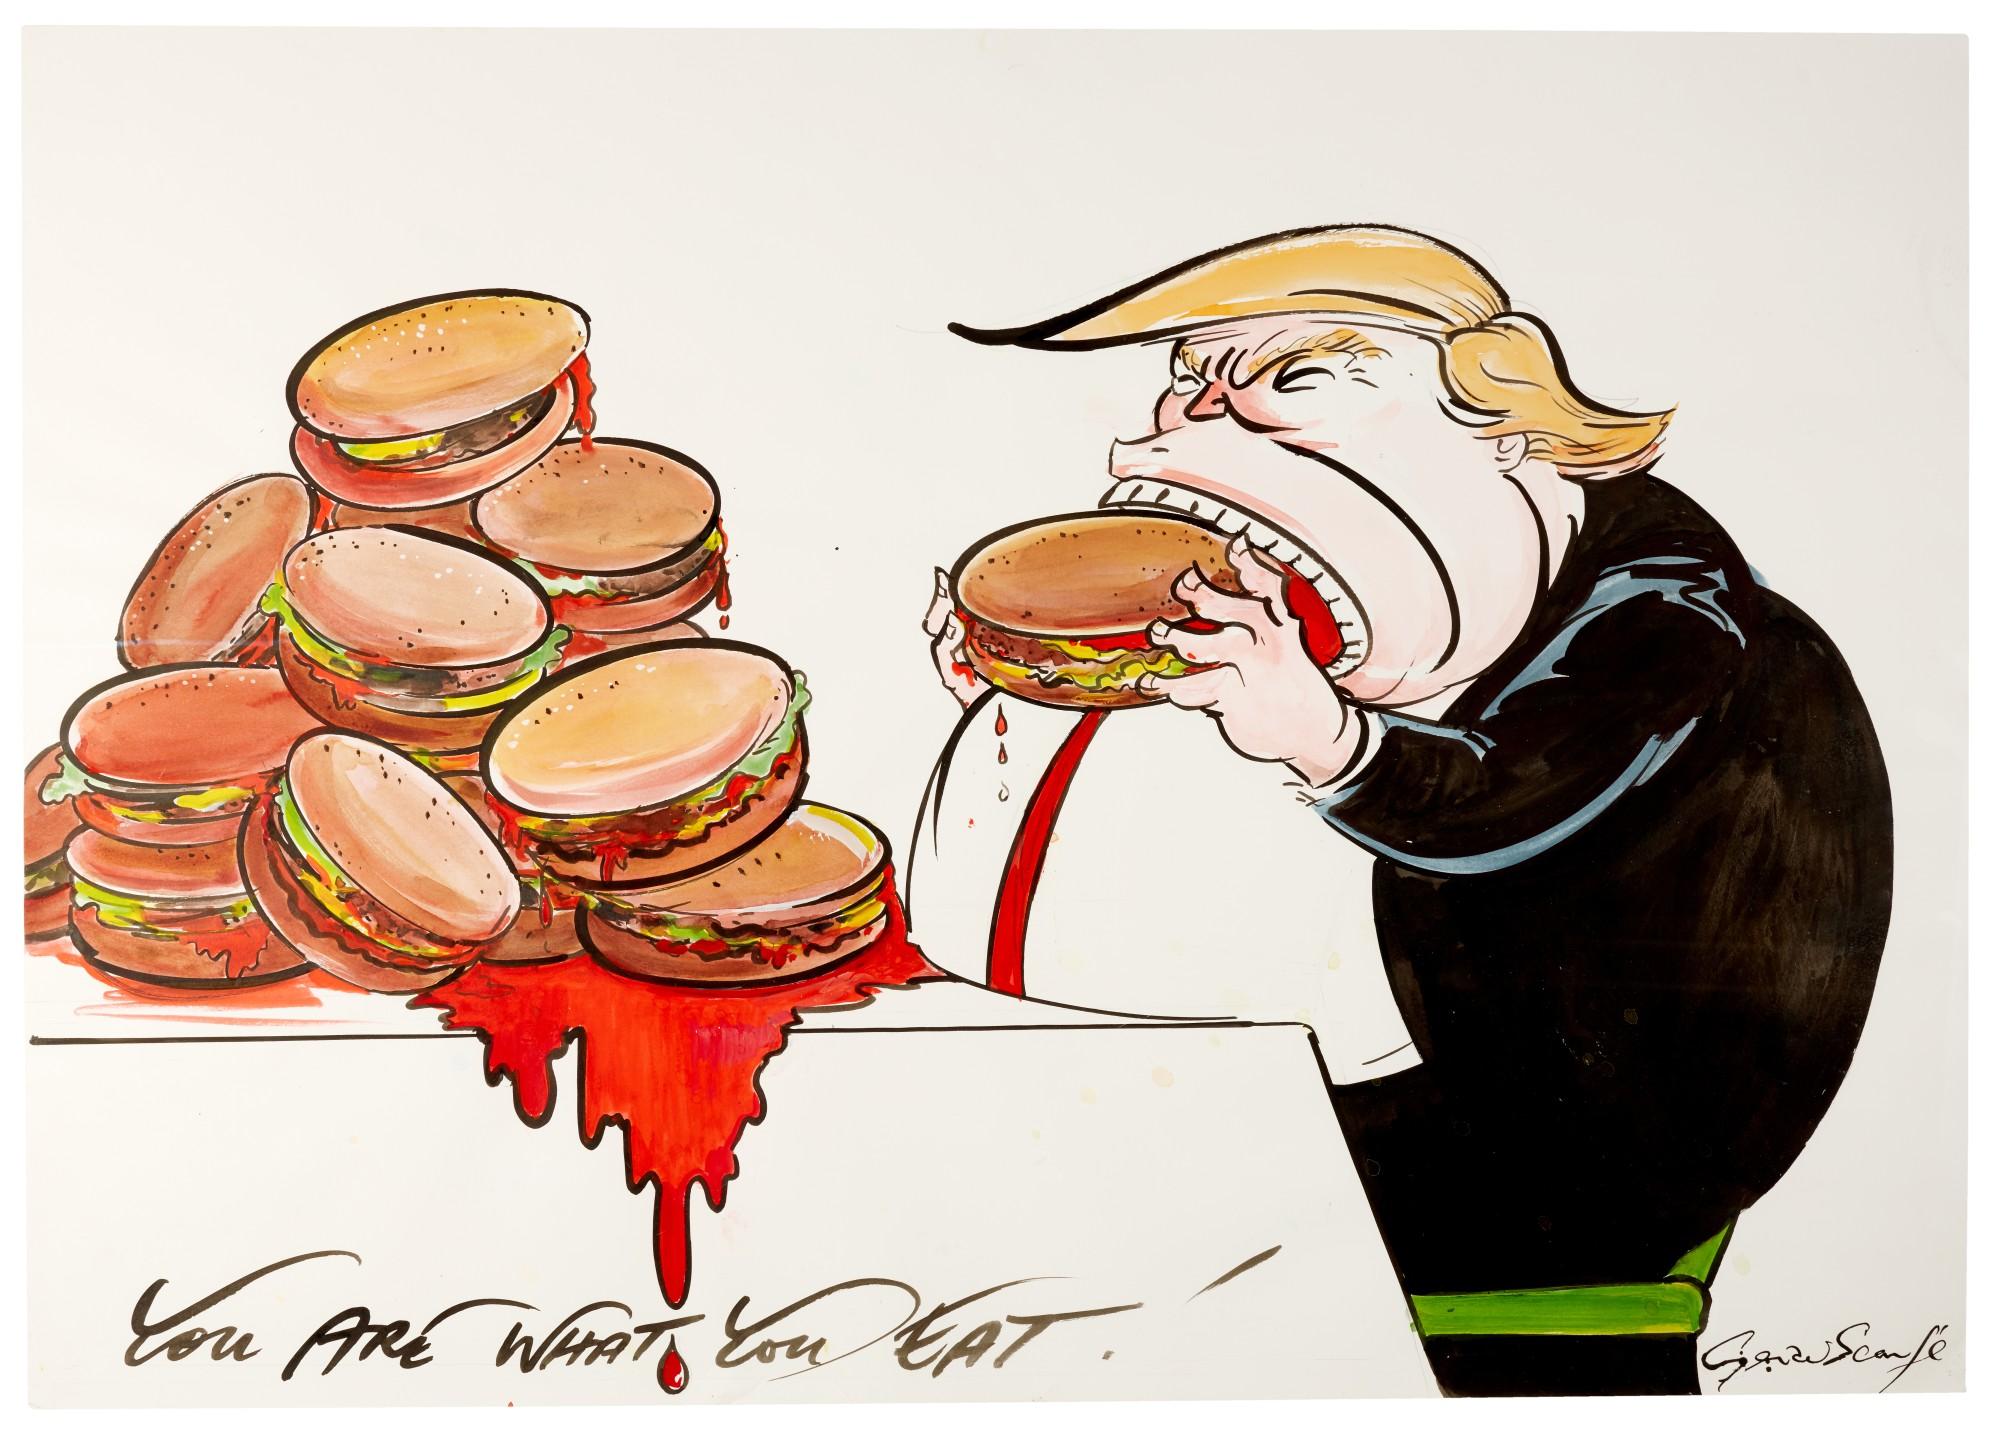 trumps fast food diet cartoons